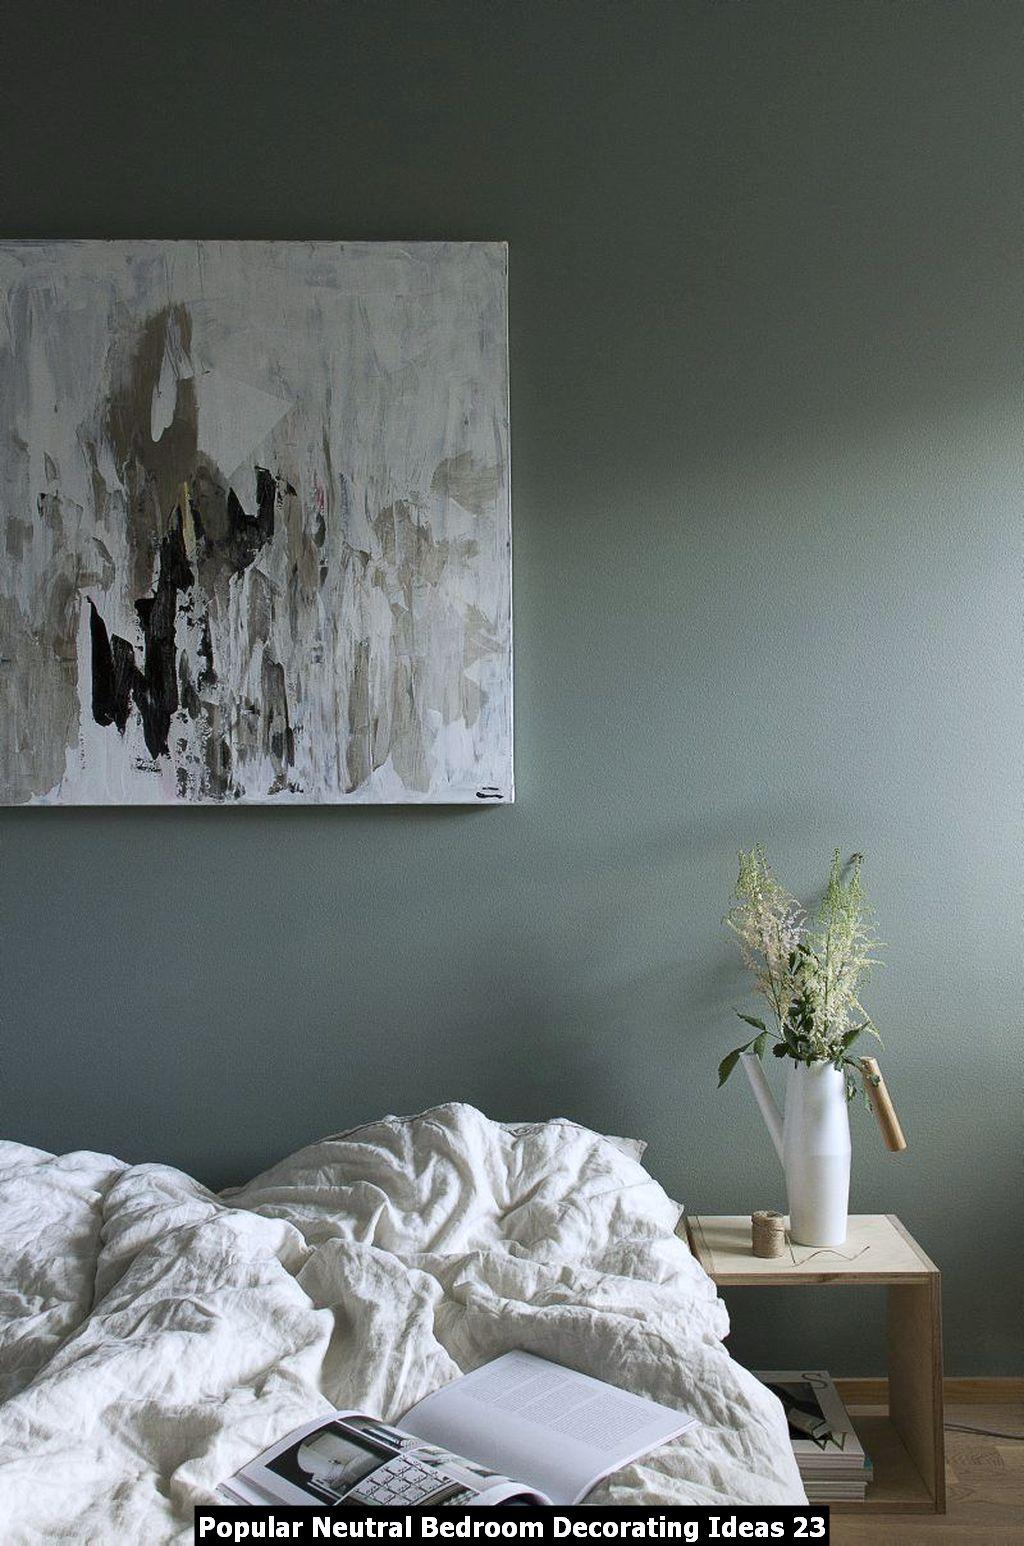 Popular Neutral Bedroom Decorating Ideas 23